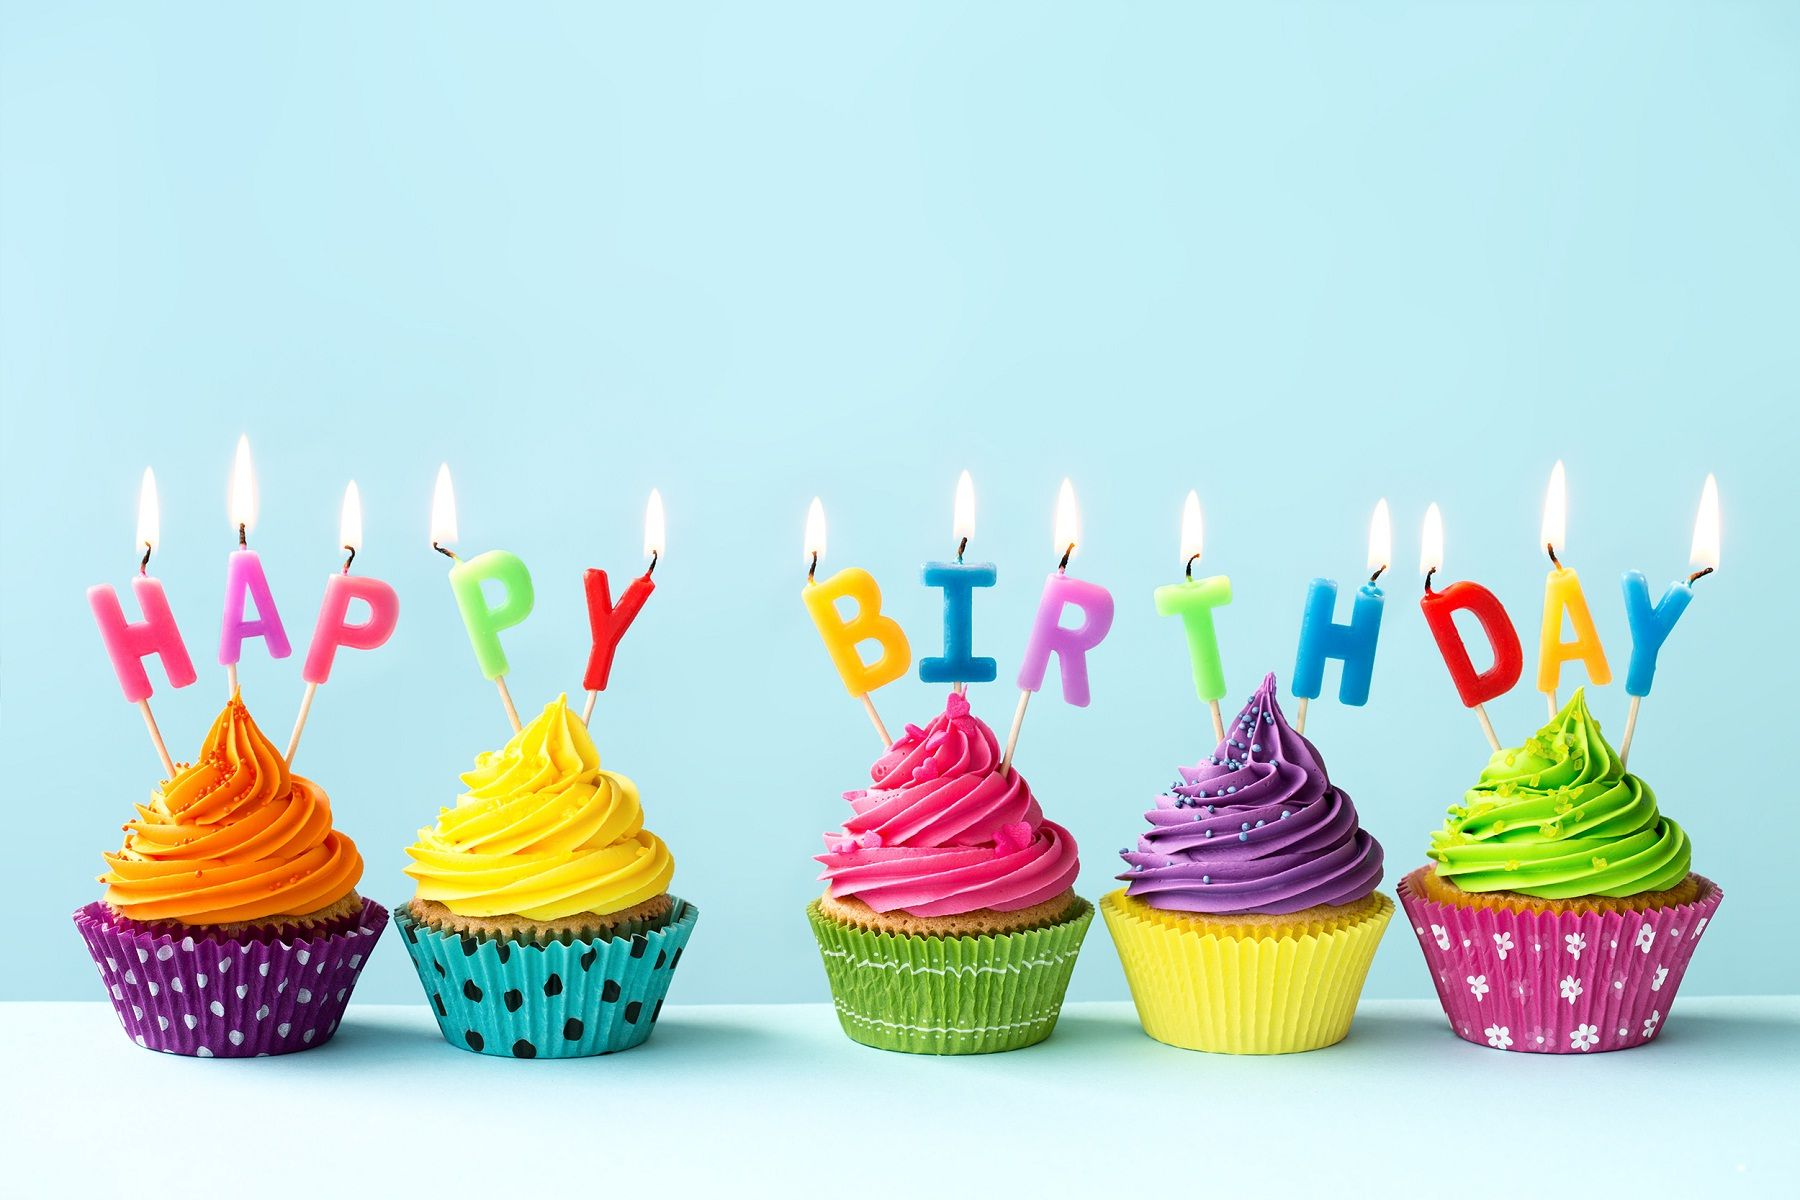 Happy birthday wallpaper birthday images pinterest - Beautiful birthday wallpaper ...